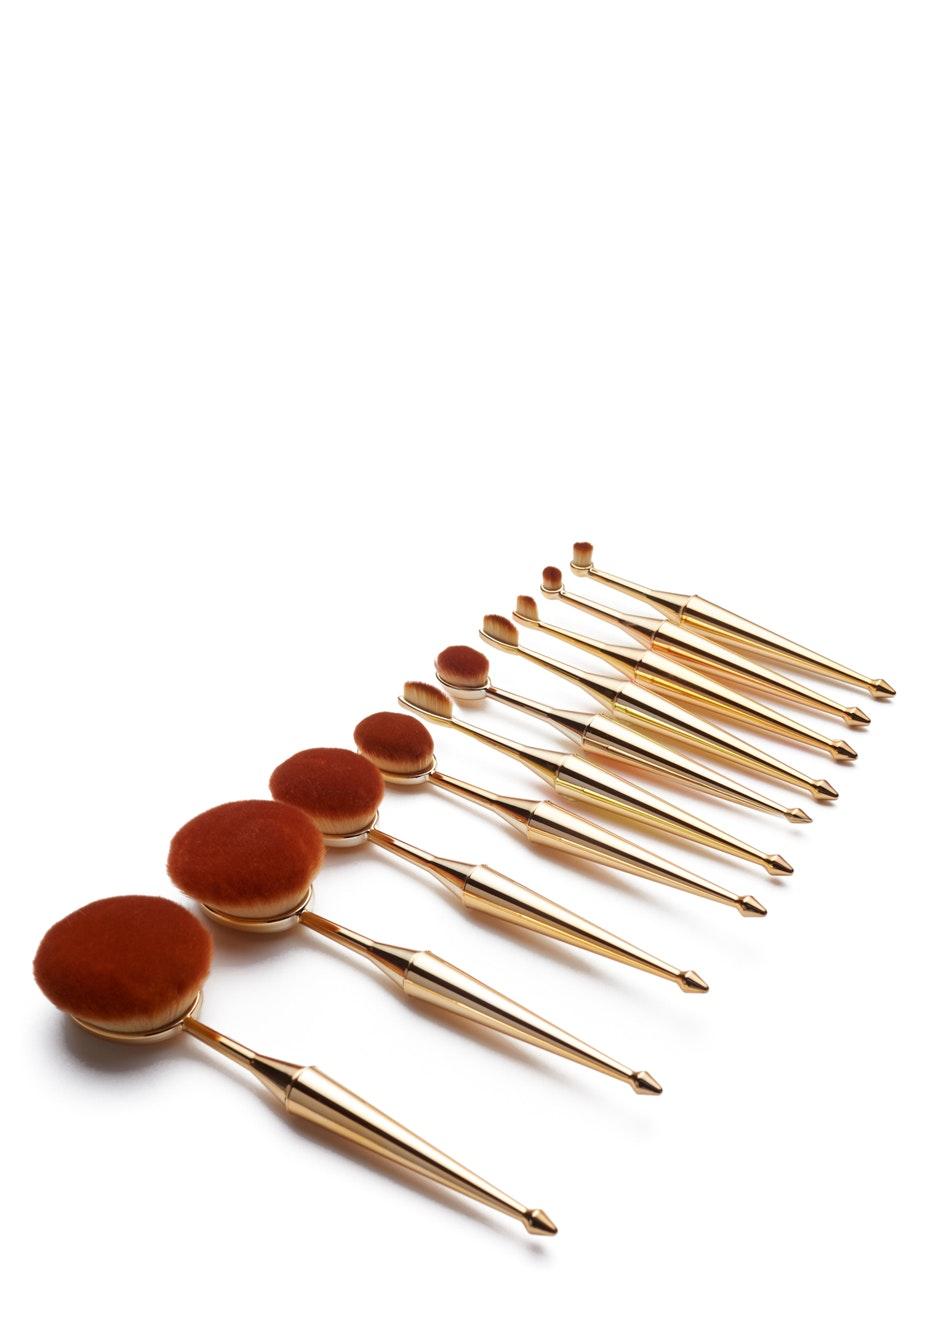 Terre Mere - Oval Brush Set - 10-pc Set